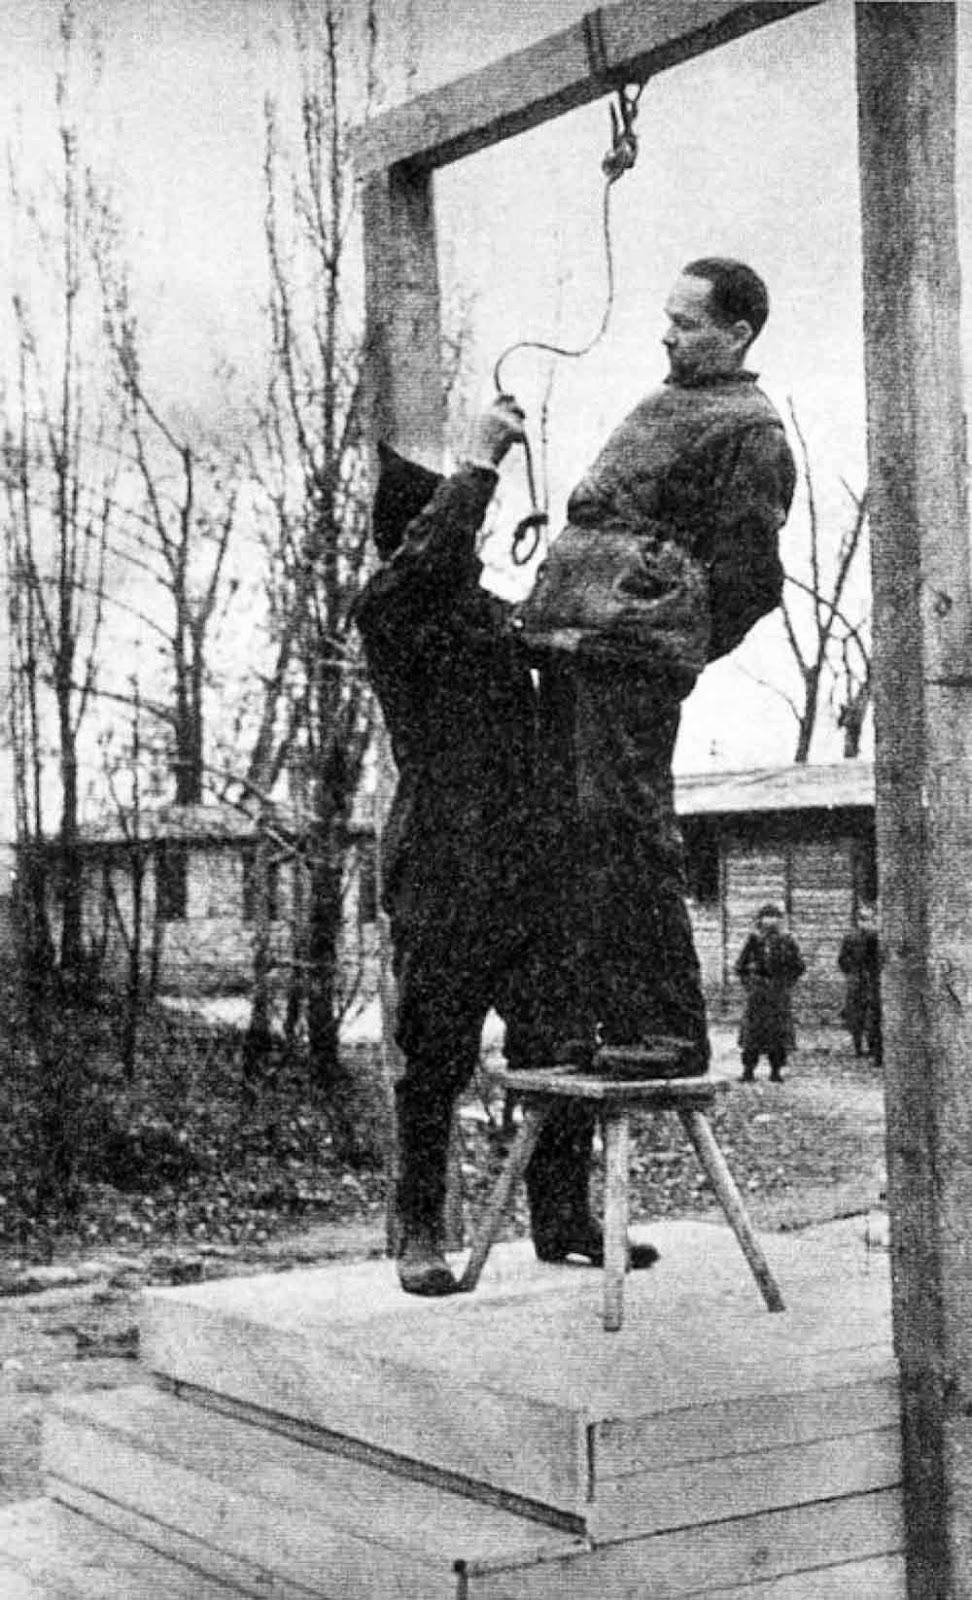 Diverses photos de la WWII - Page 40 94011